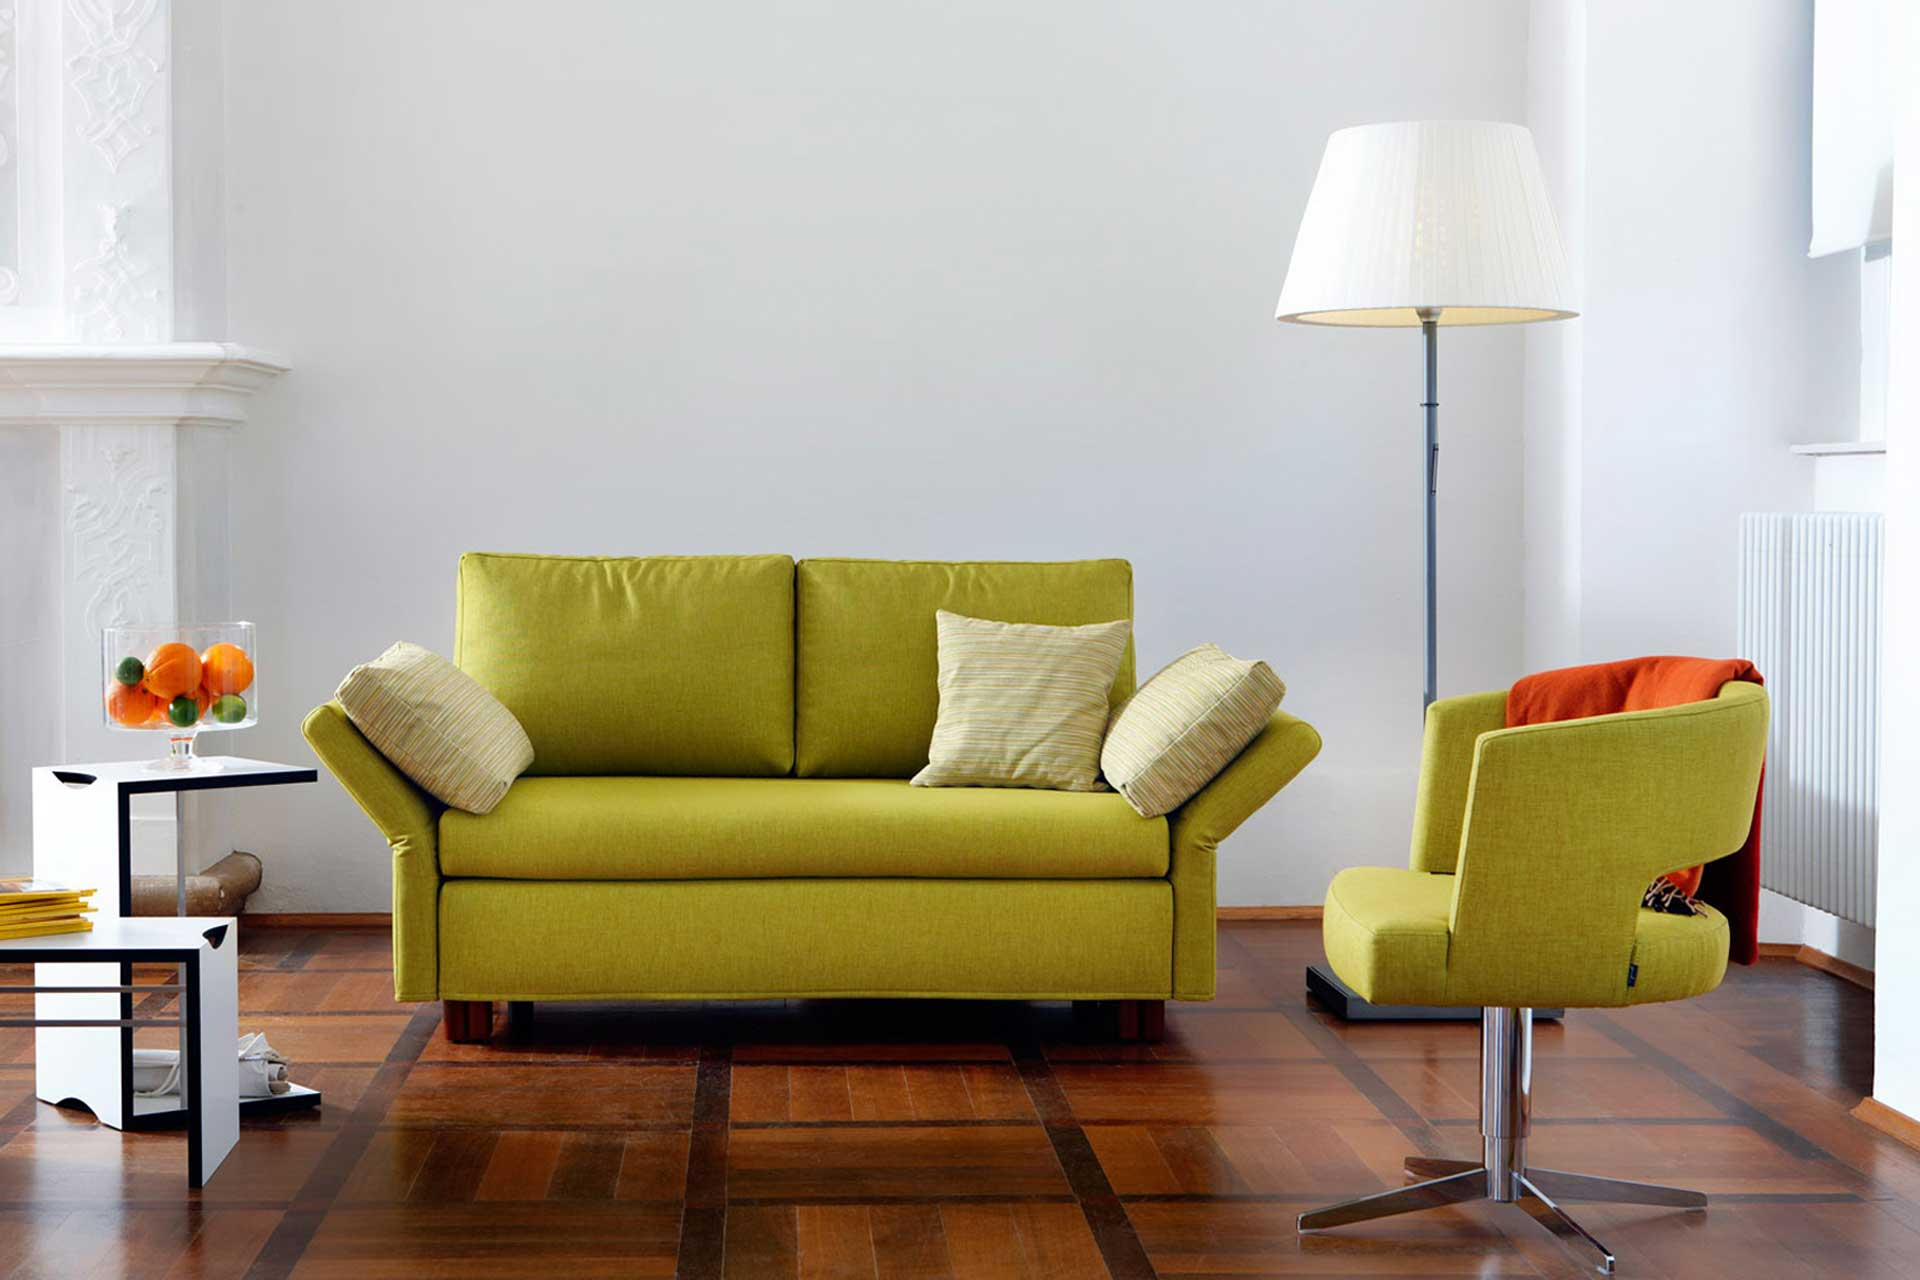 aktions schlafsofa petra 136 wohnopposition berlin. Black Bedroom Furniture Sets. Home Design Ideas